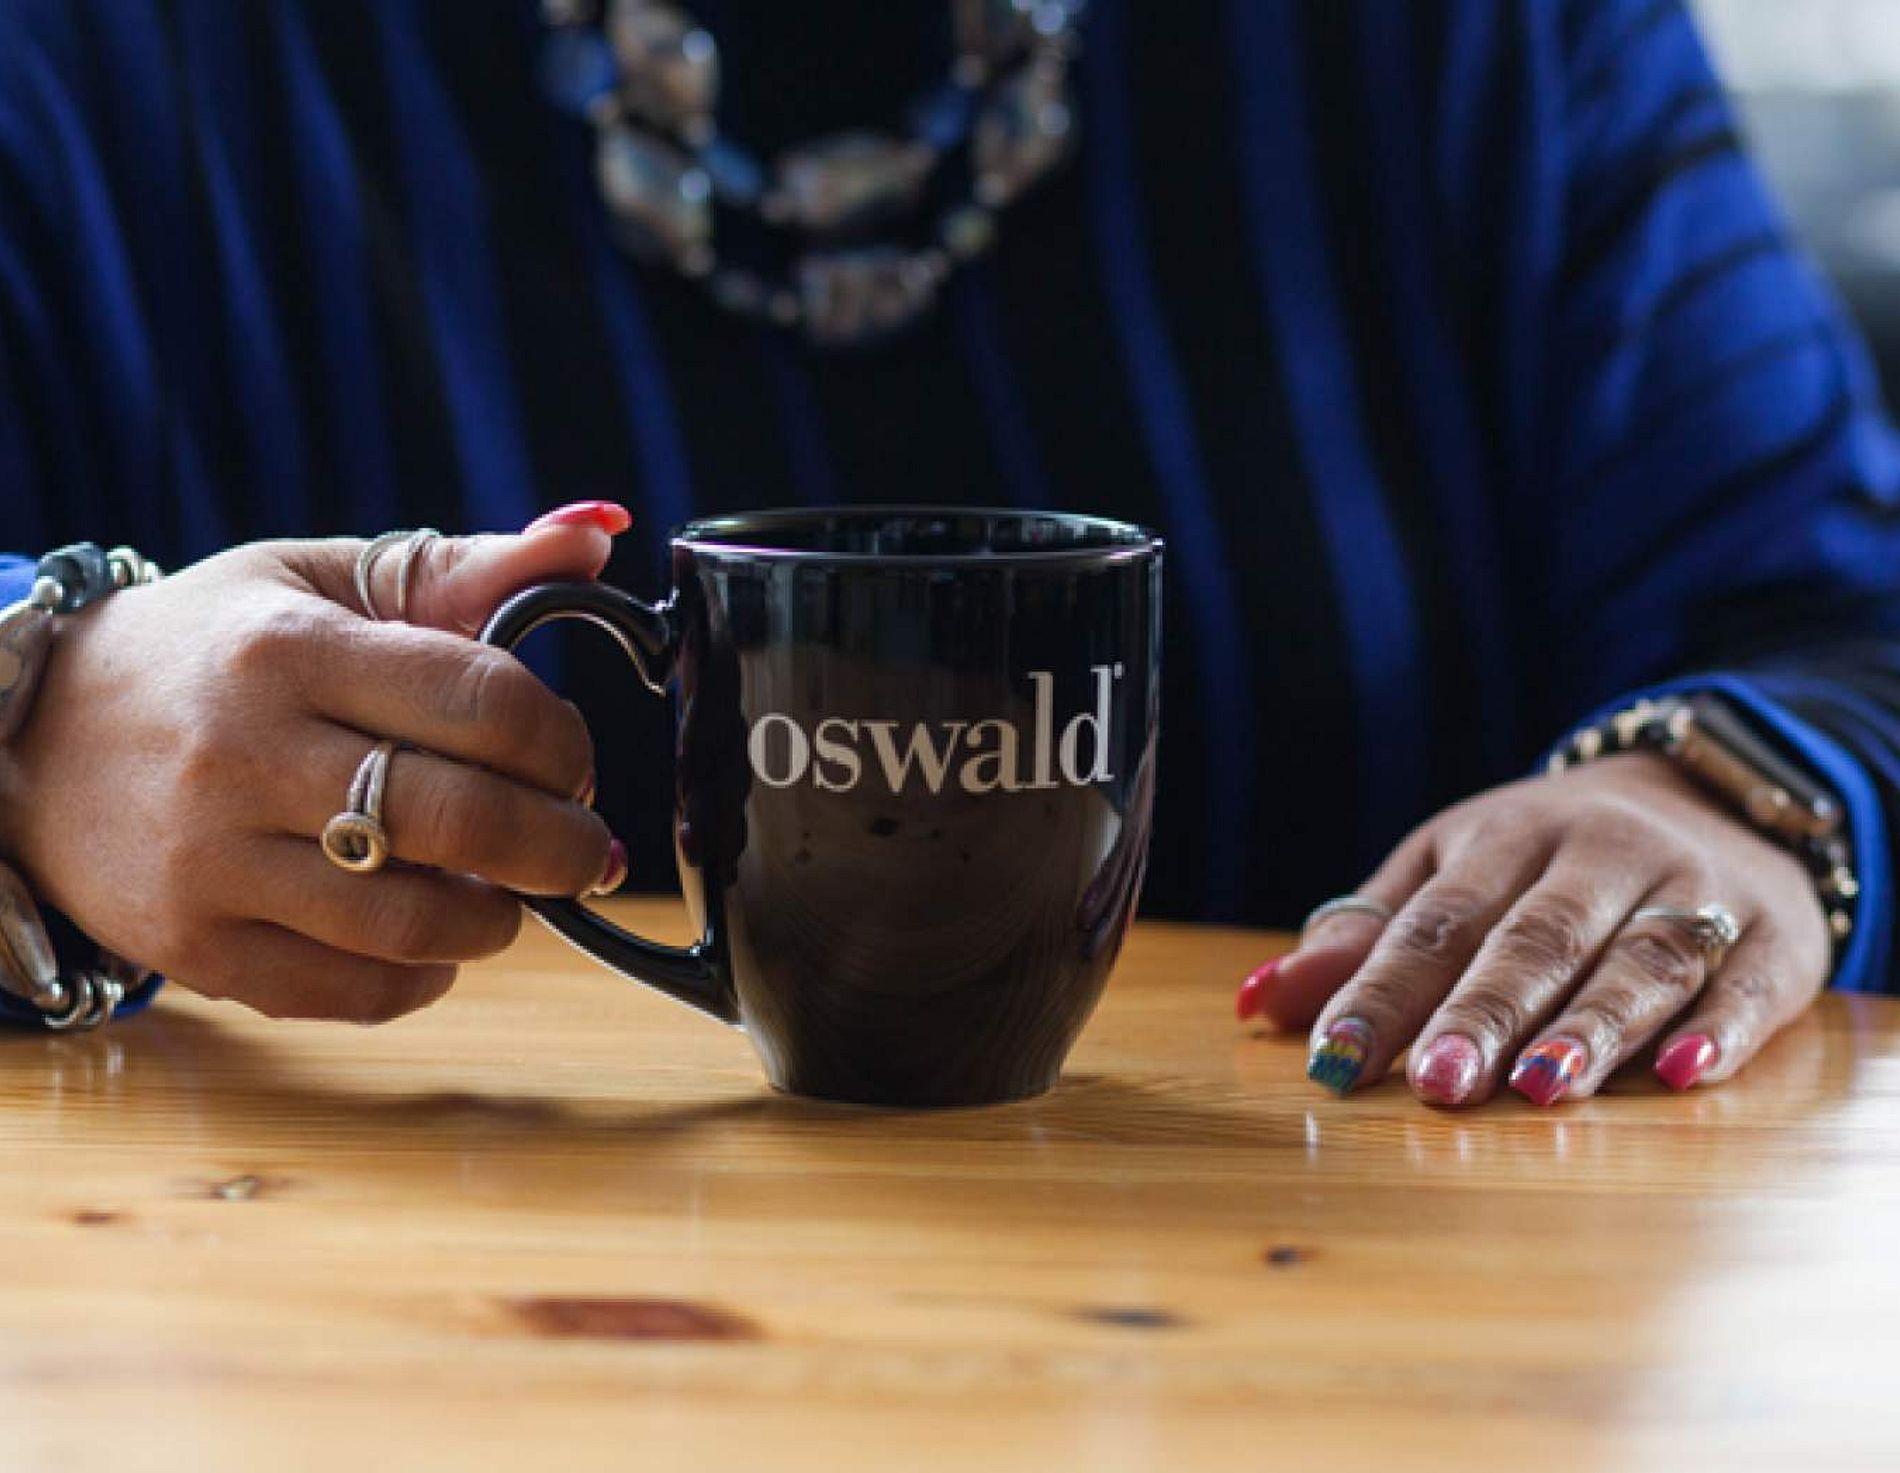 Woman holding a Oswald coffee mug